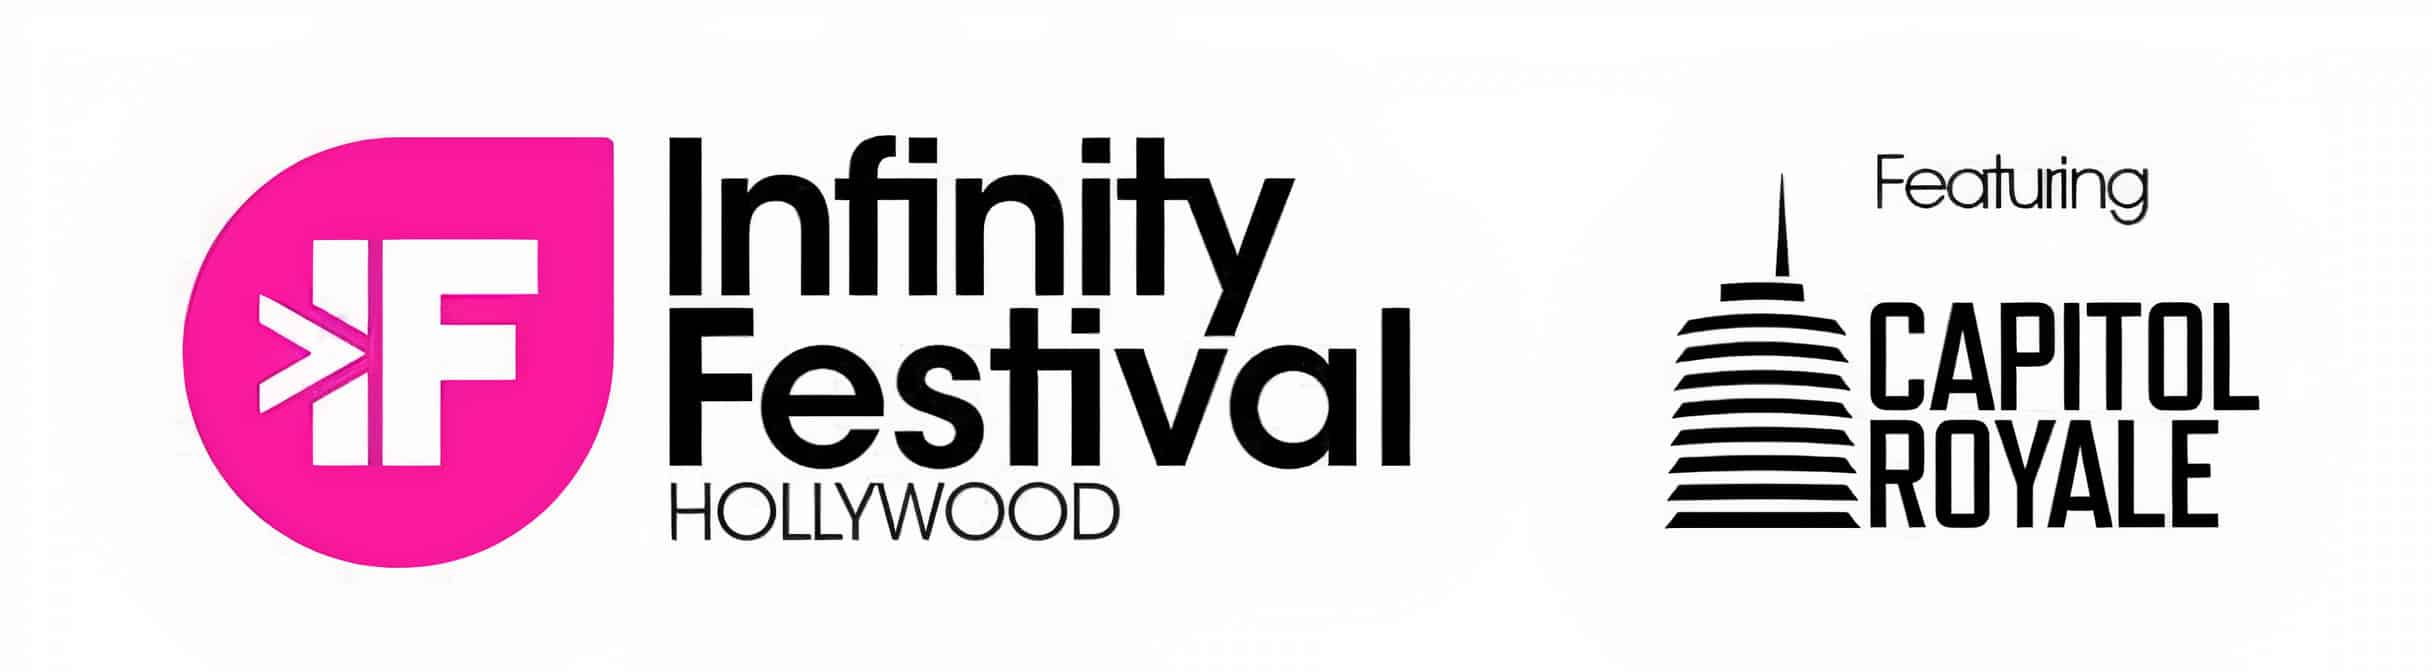 Infinity Festival Hollywood logo